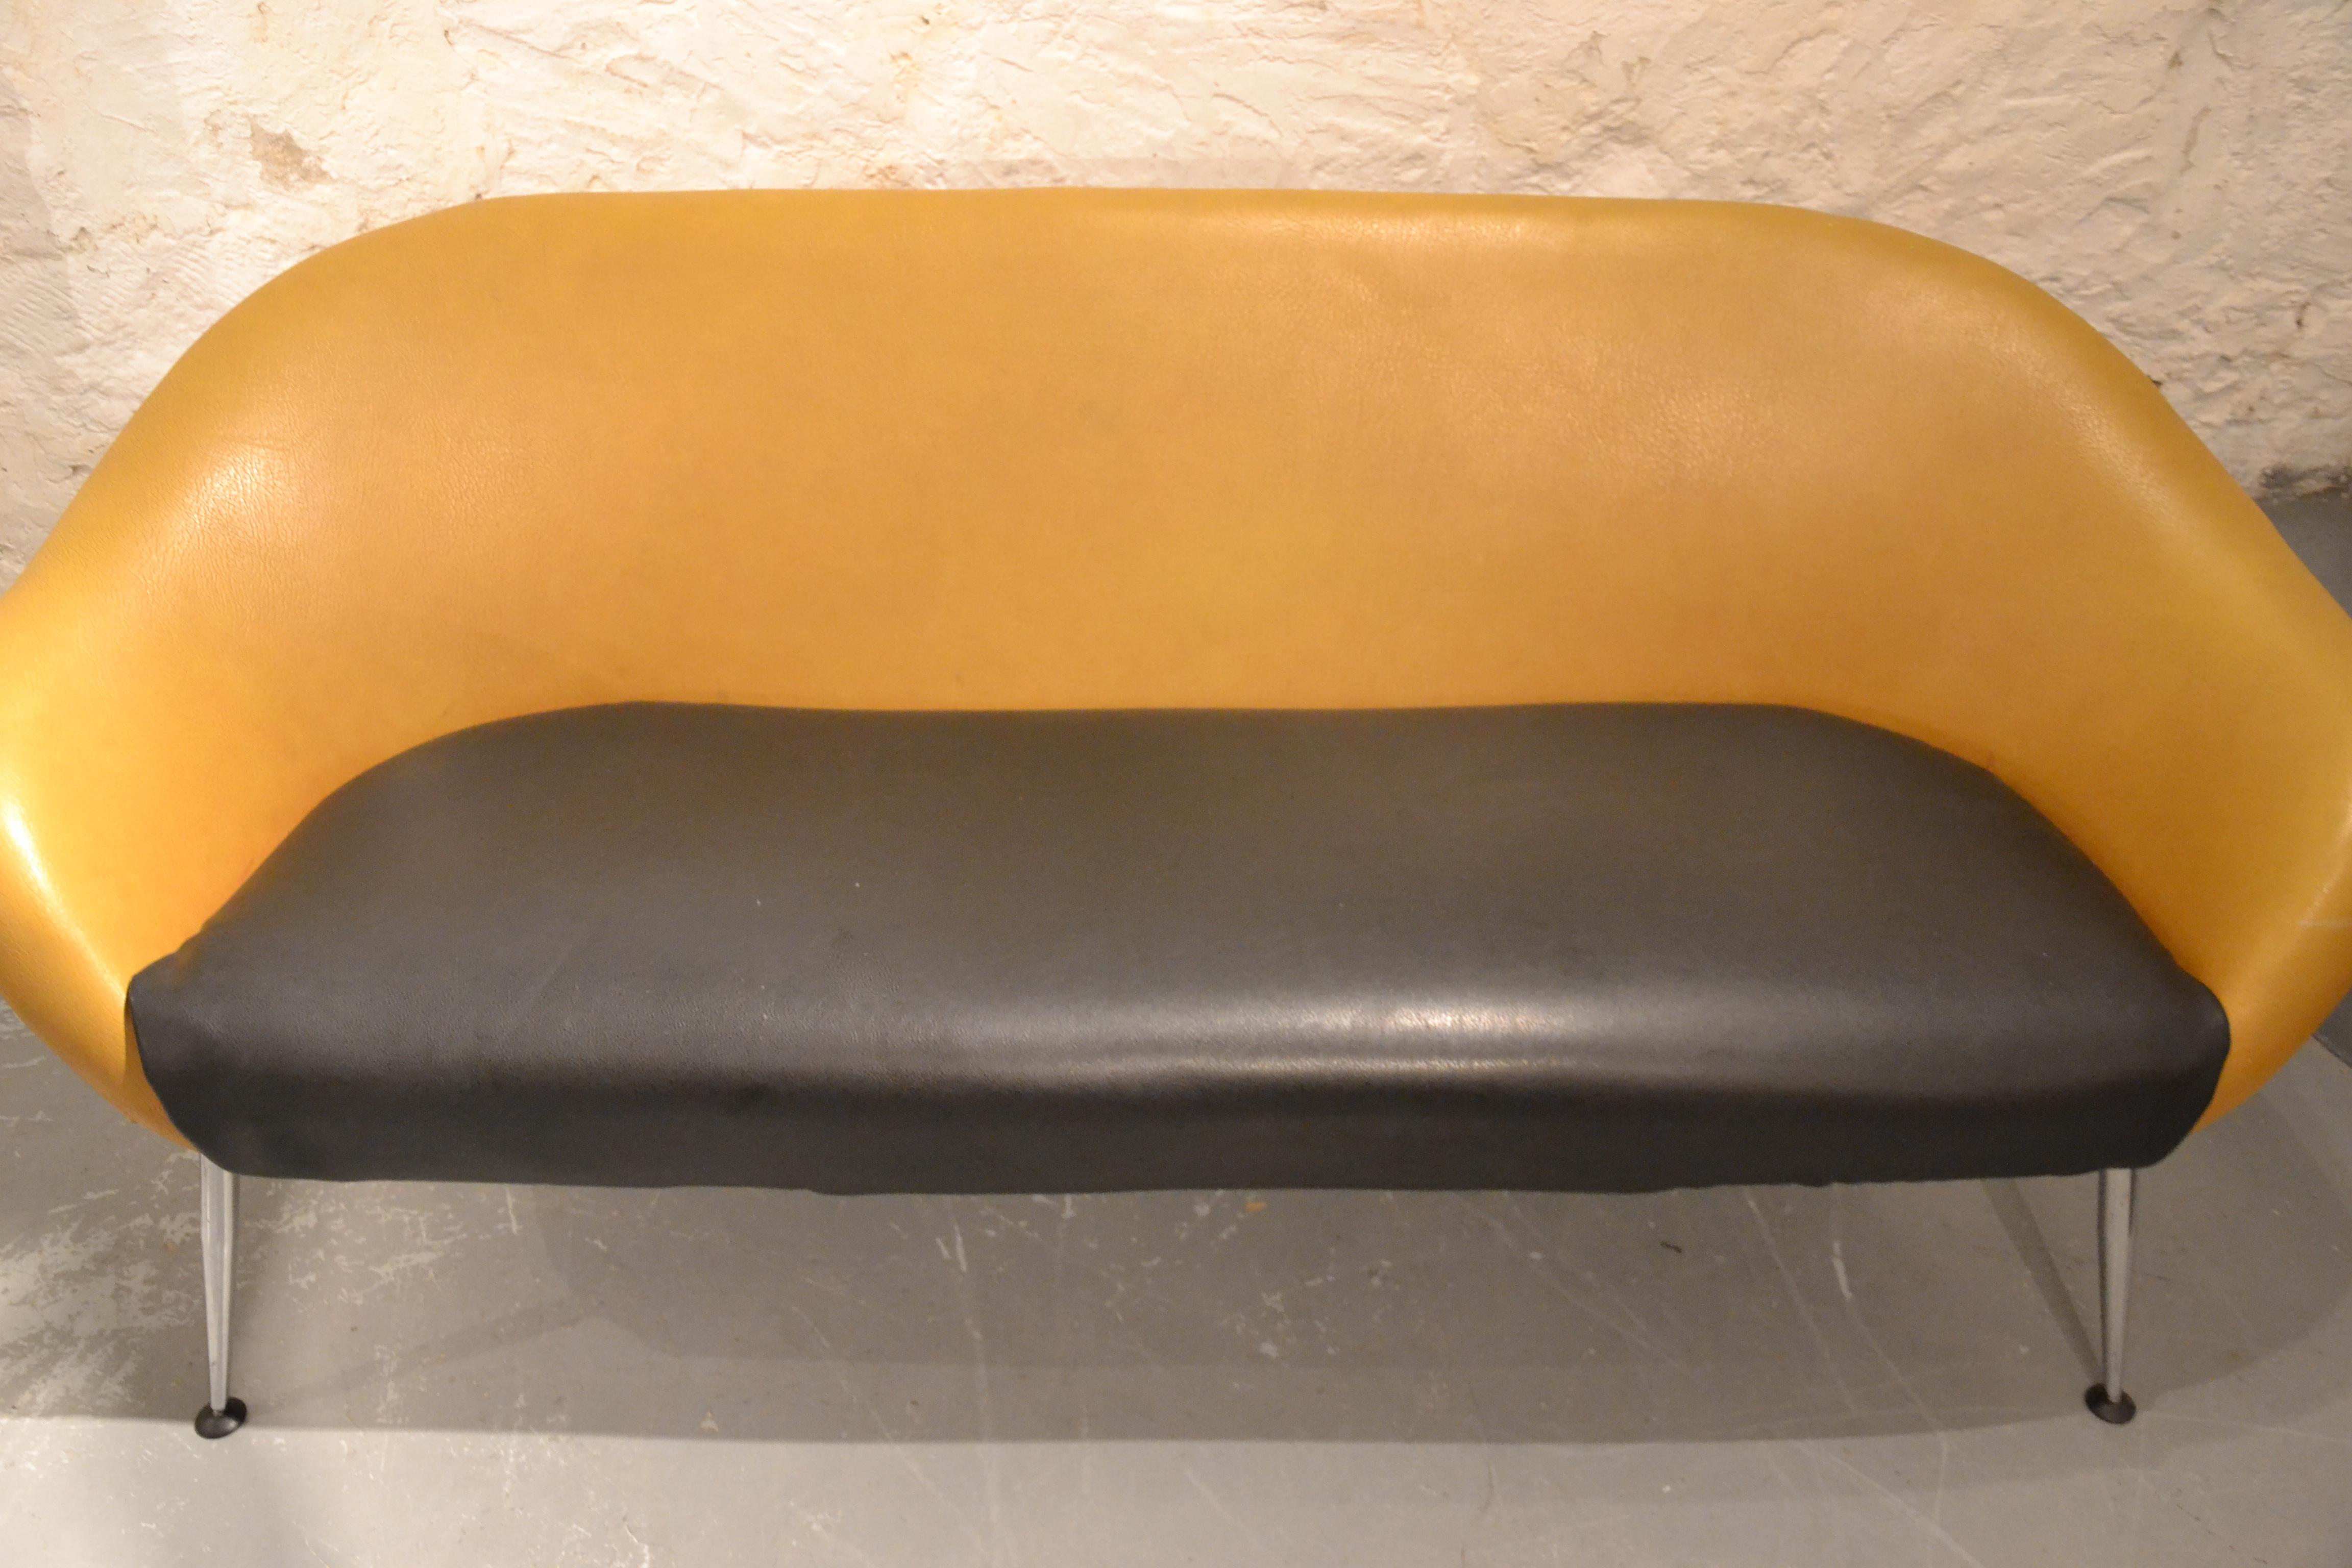 canap egg des ann es 60 bindiesbindies. Black Bedroom Furniture Sets. Home Design Ideas